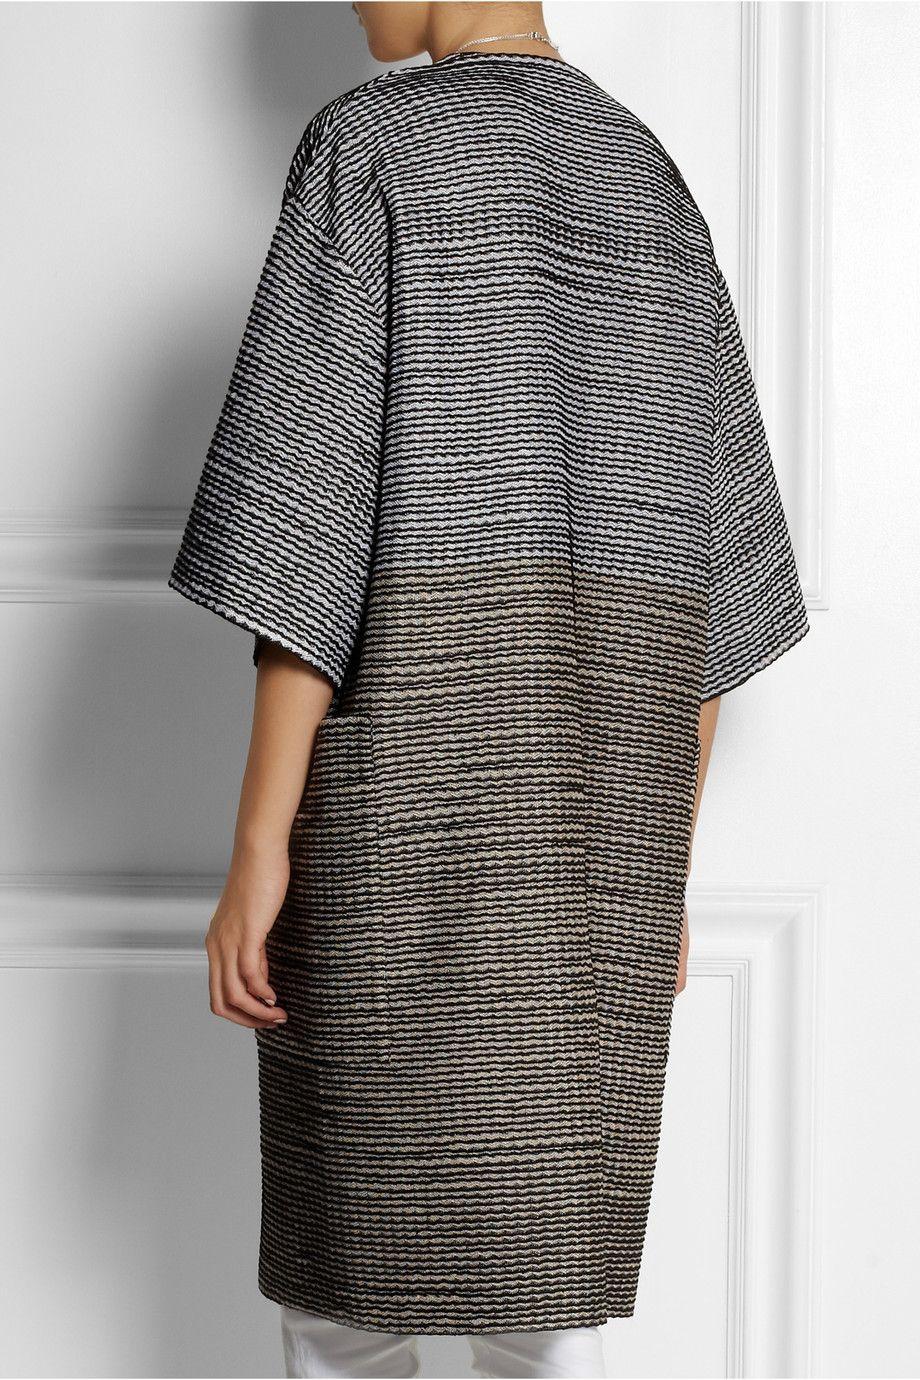 MissoniOversized crochet-knit coat